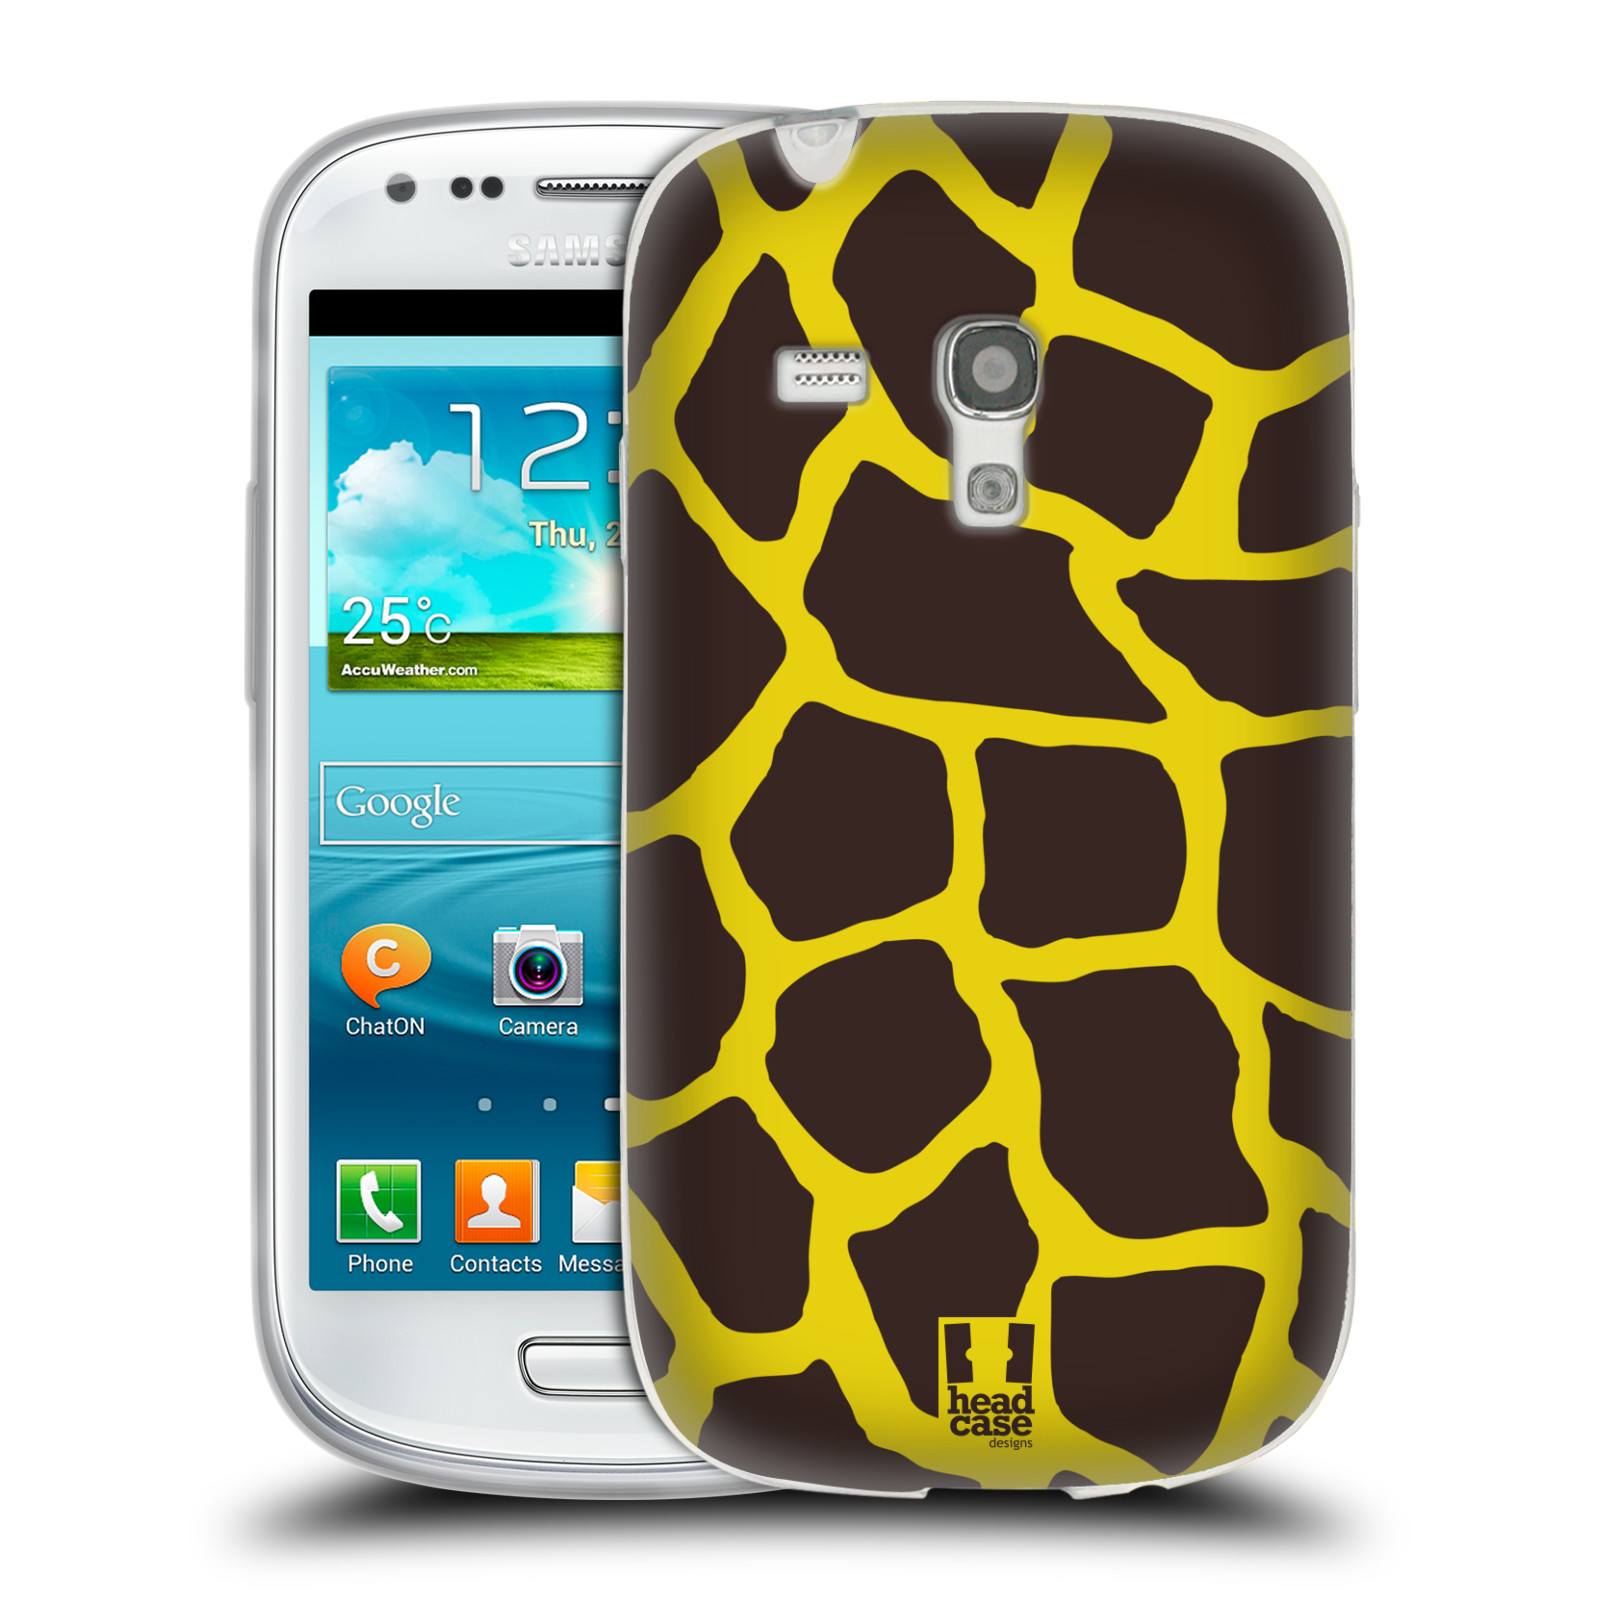 HEAD CASE silikonový obal na mobil Samsung Galaxy S3 MINI i8190 vzor Divočina zvíře 2 žirafa